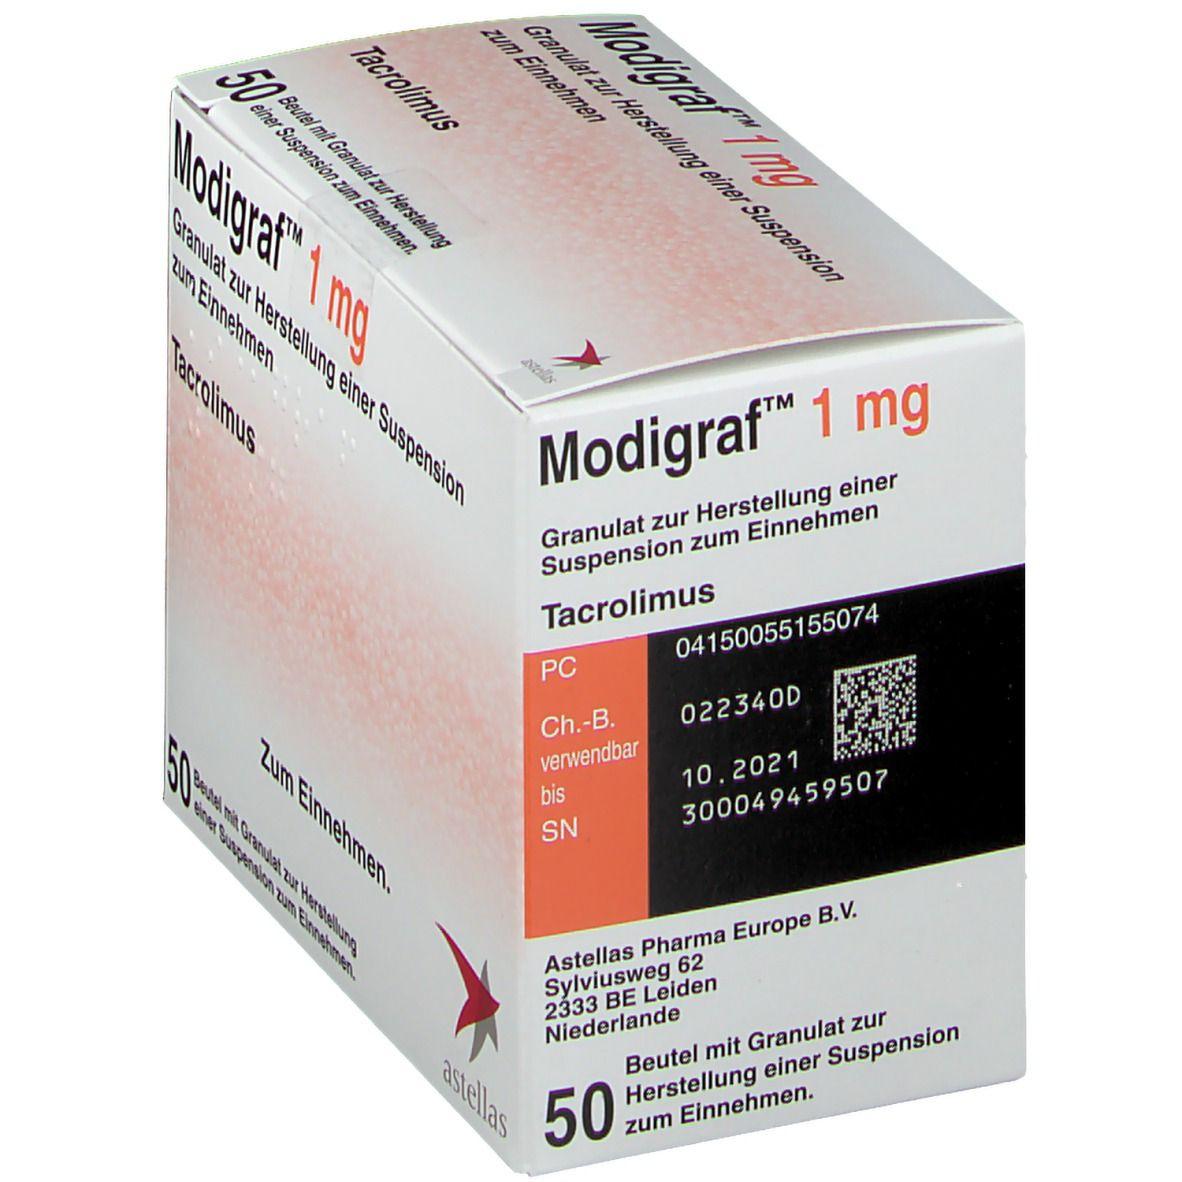 MODIGRAF 1 mg Granulat